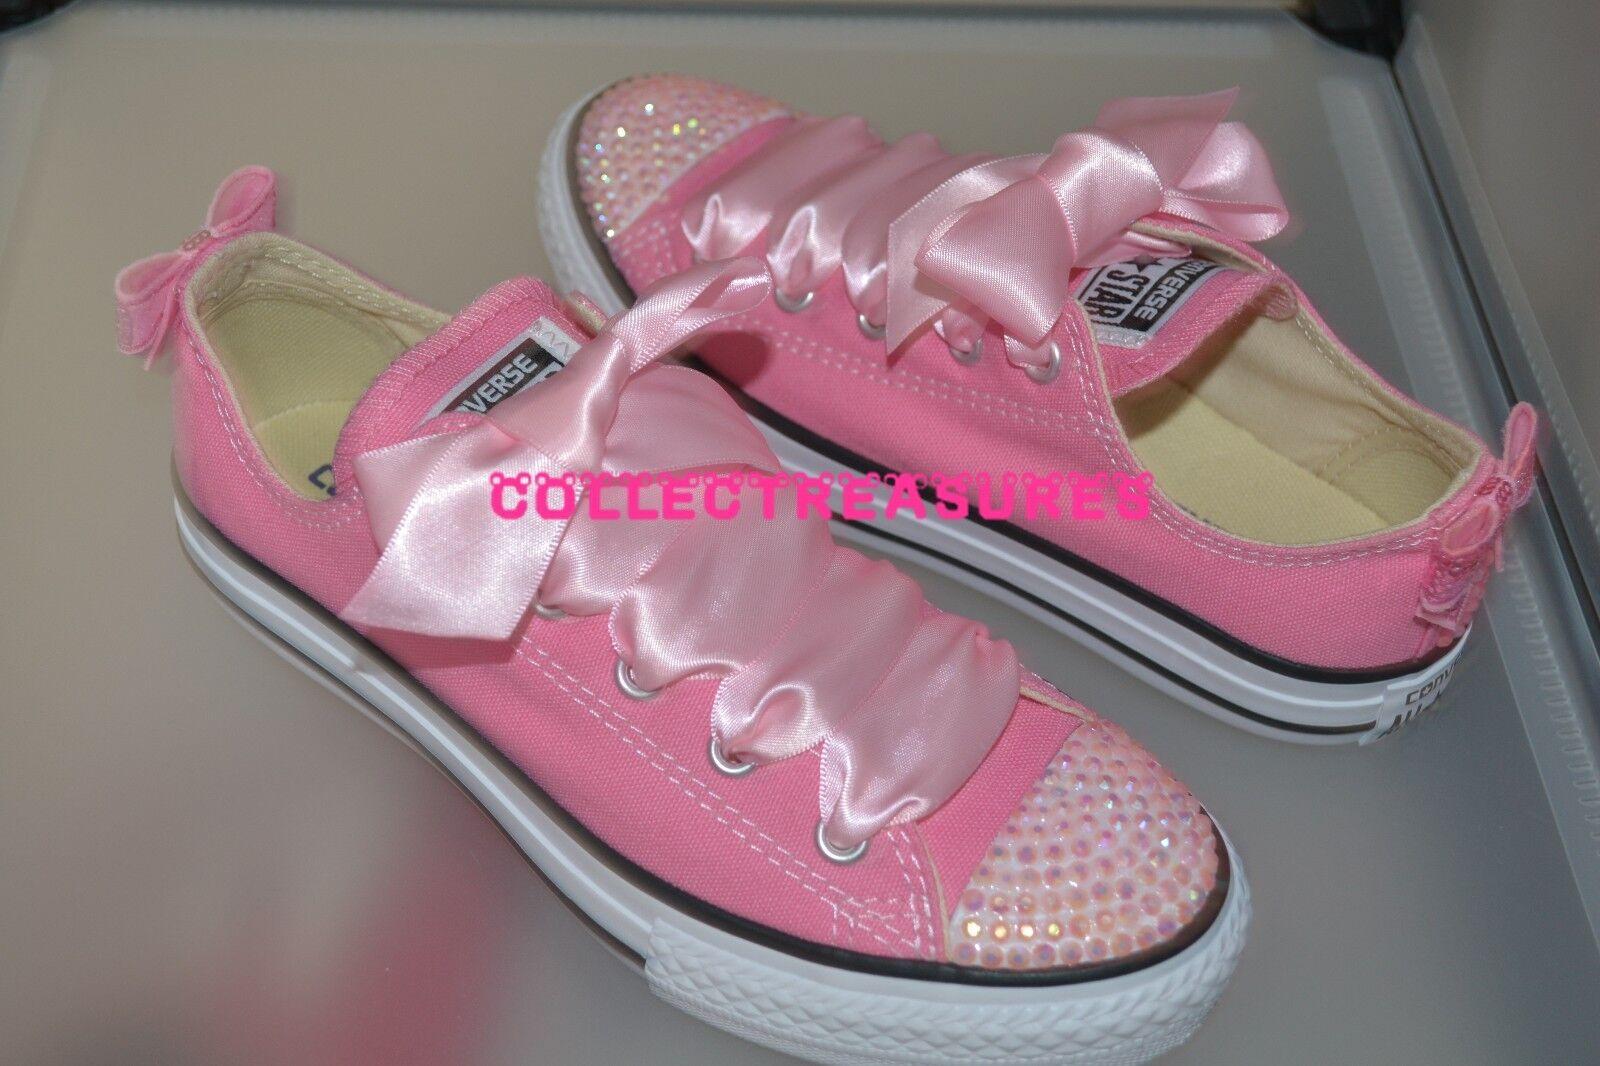 176cfe9946e ... discount custom cristal strass bling rose lo top converse baskets  baskets converse taille b8f0c5 2b5b3 6edb8